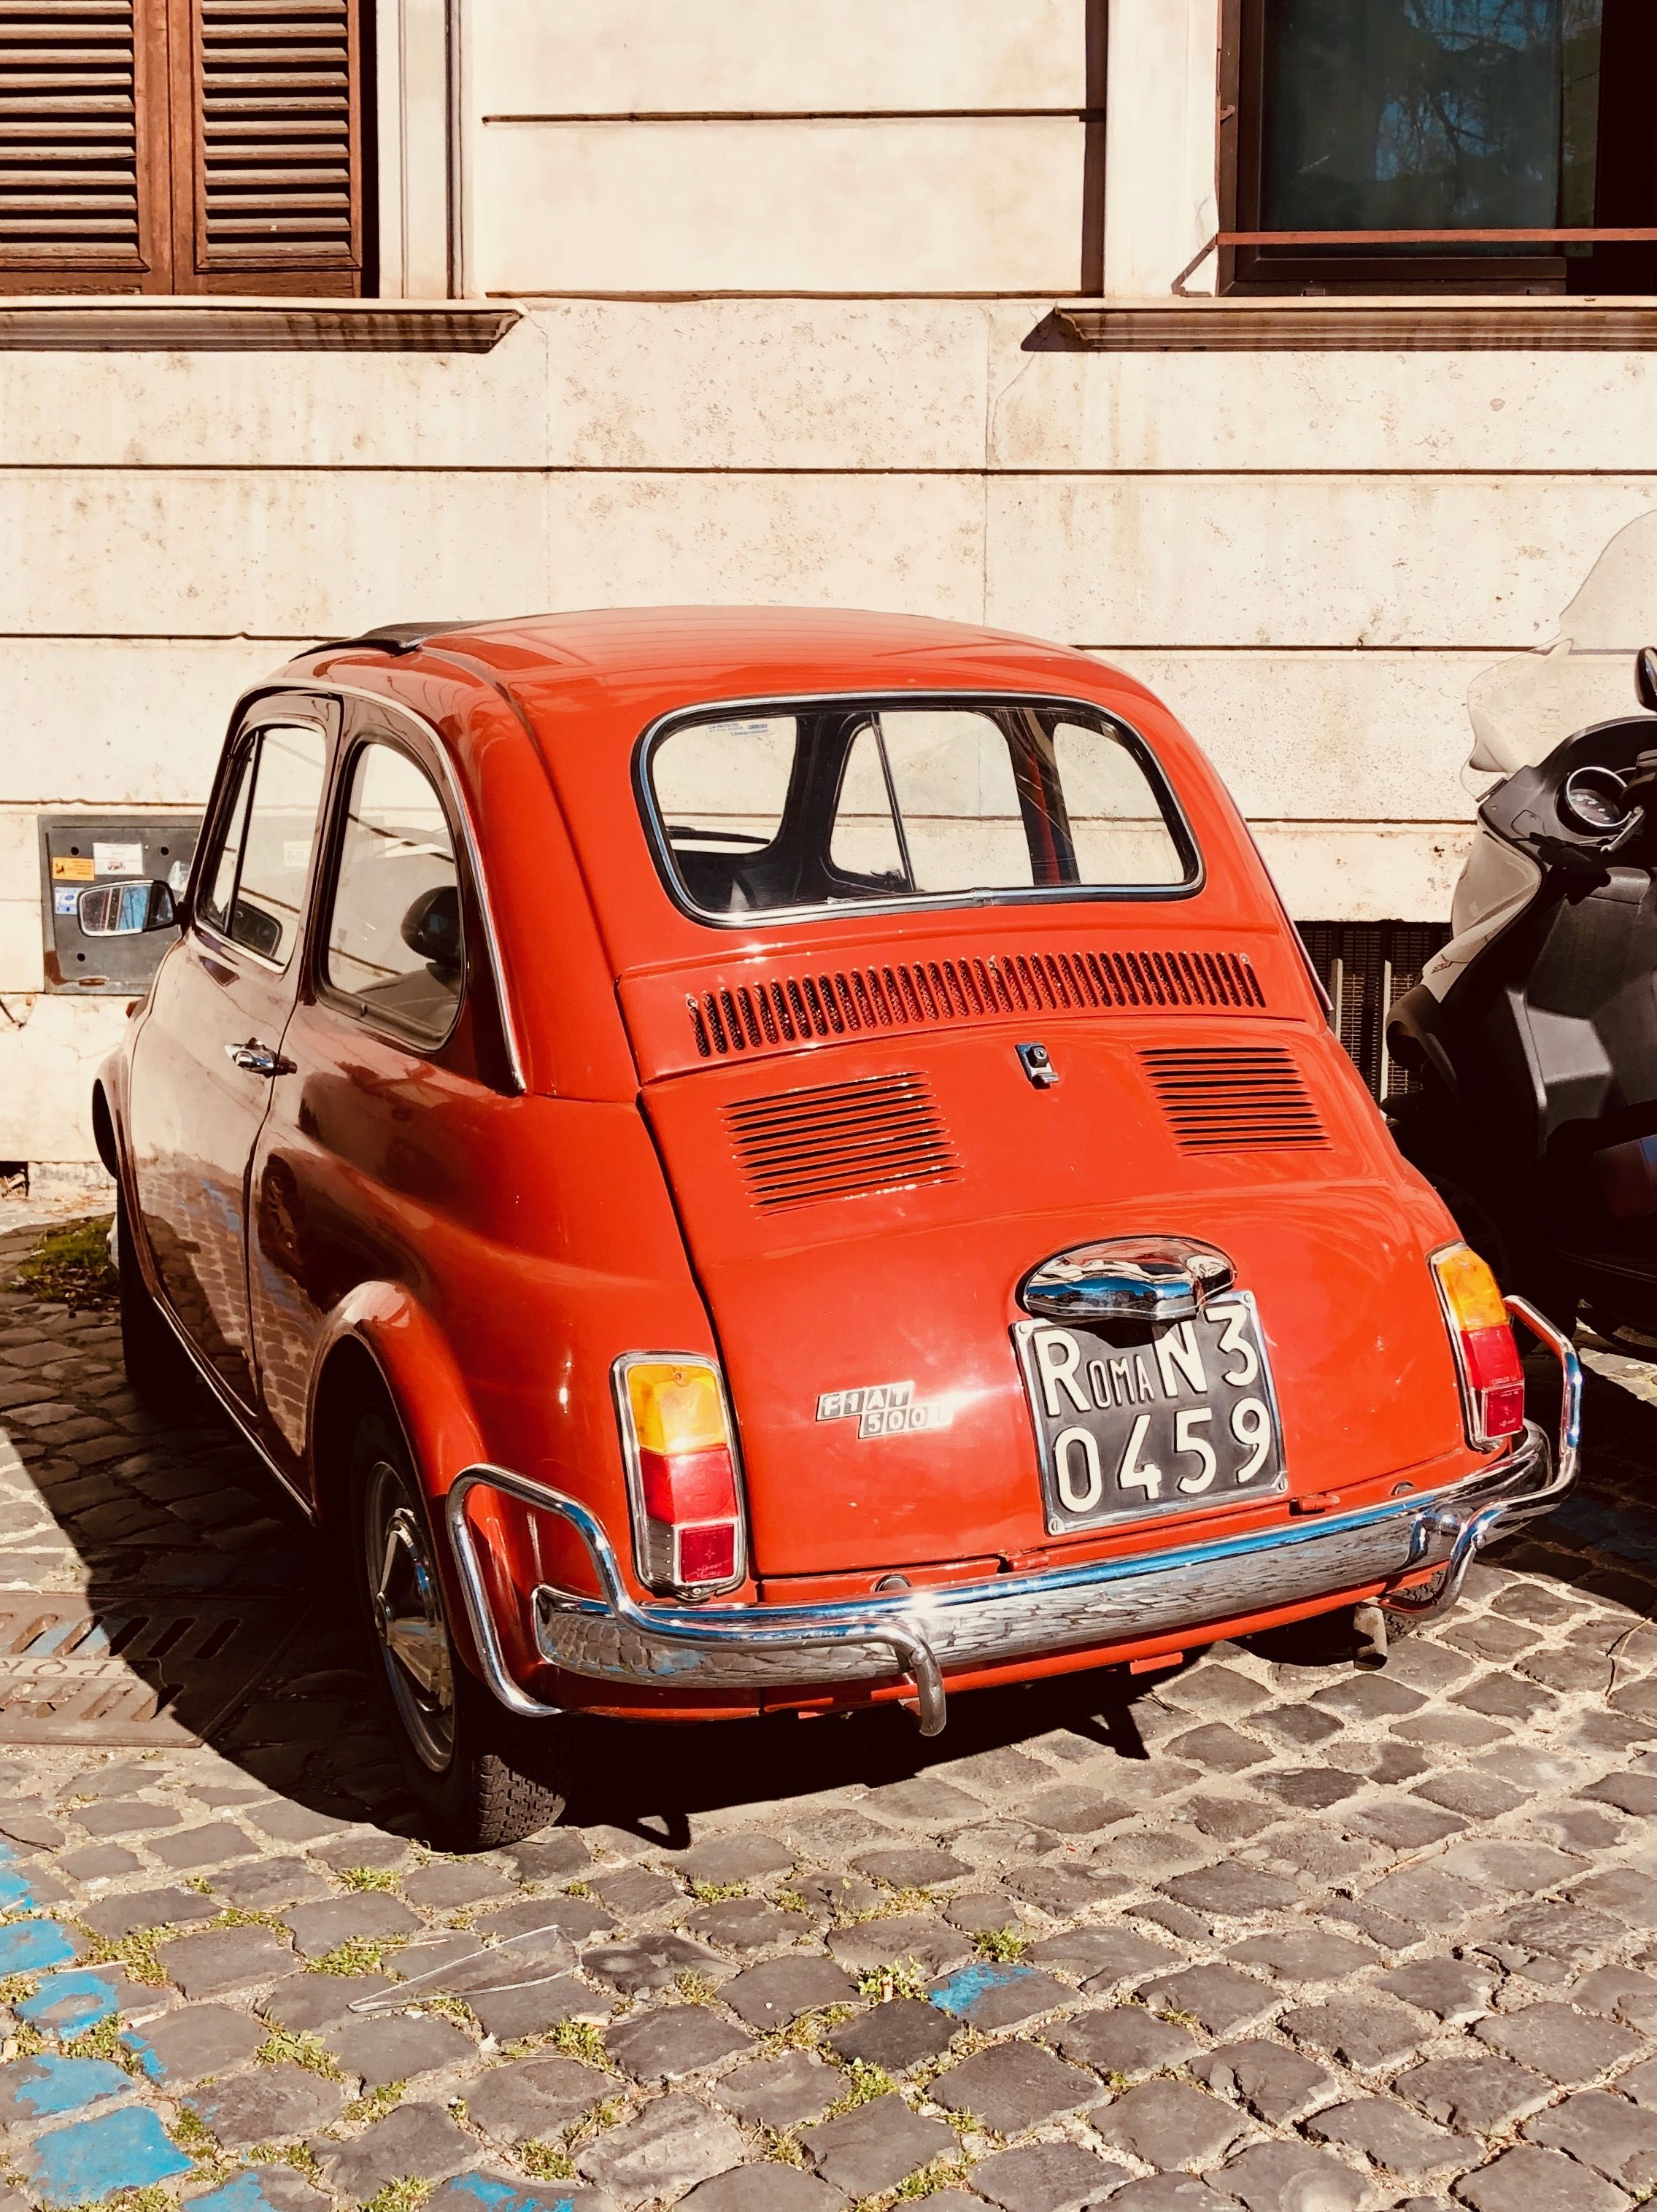 Pin By Baleful Guevara On Vw Beetle Kombi Vw Beetles Fiat 500 Fiat